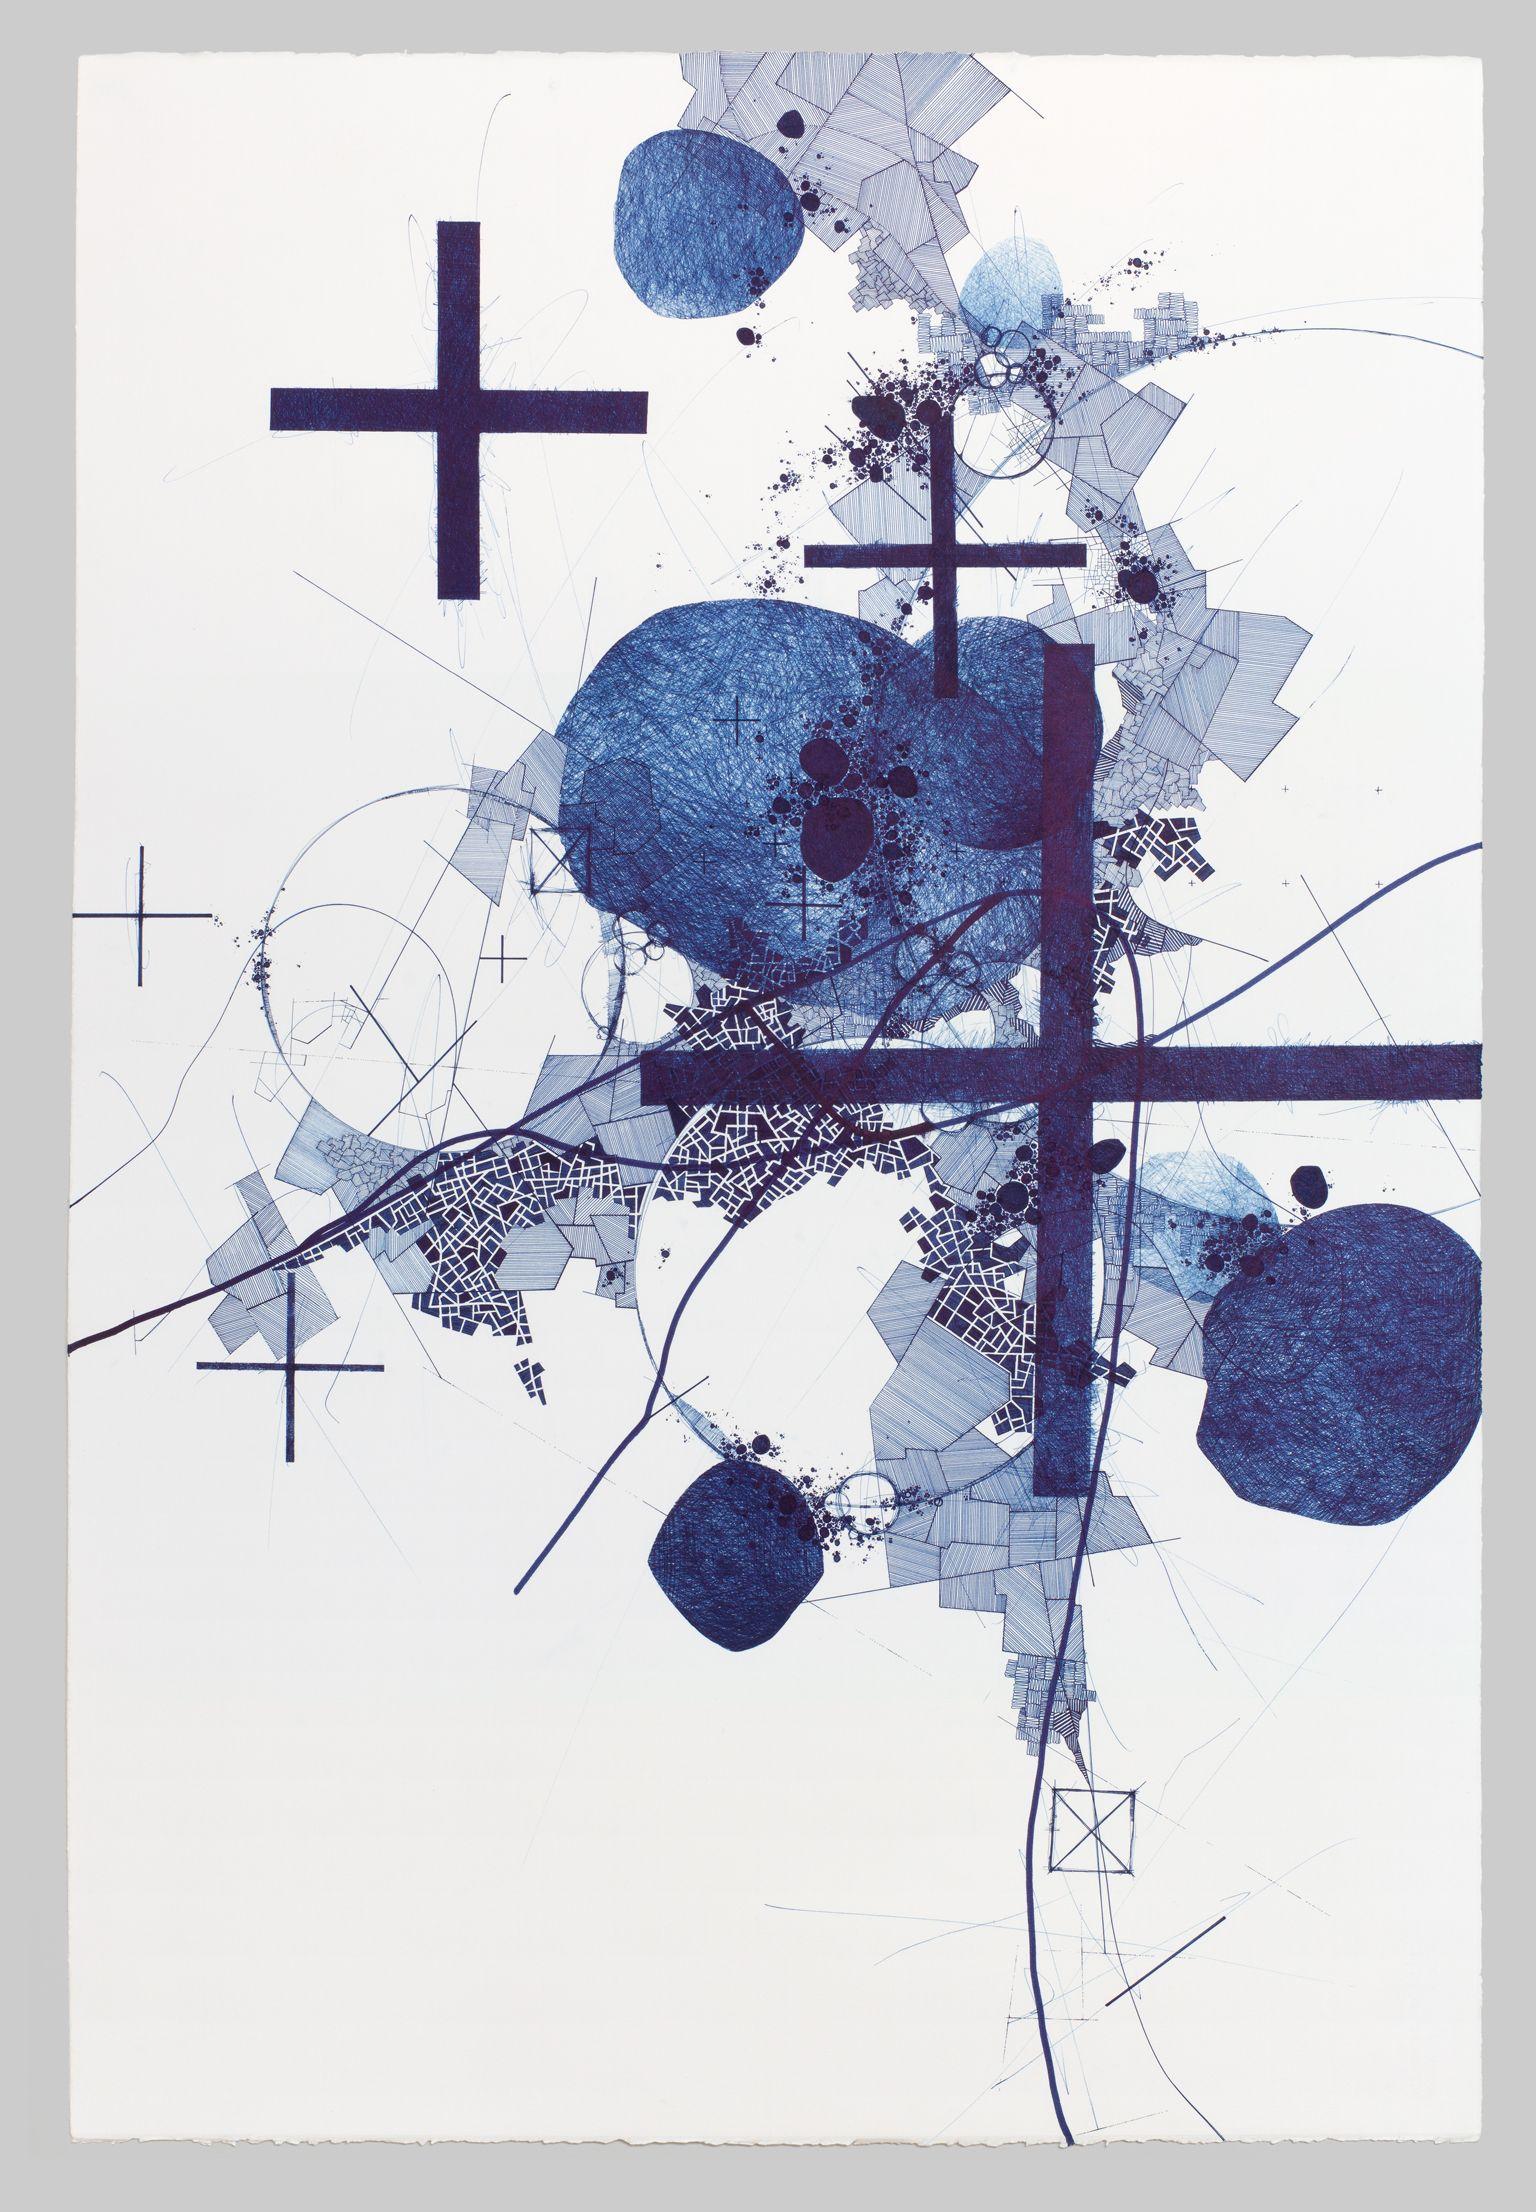 Derek Lerner - Asvirus 58, 2015 Ink on paper 44 x 30 in